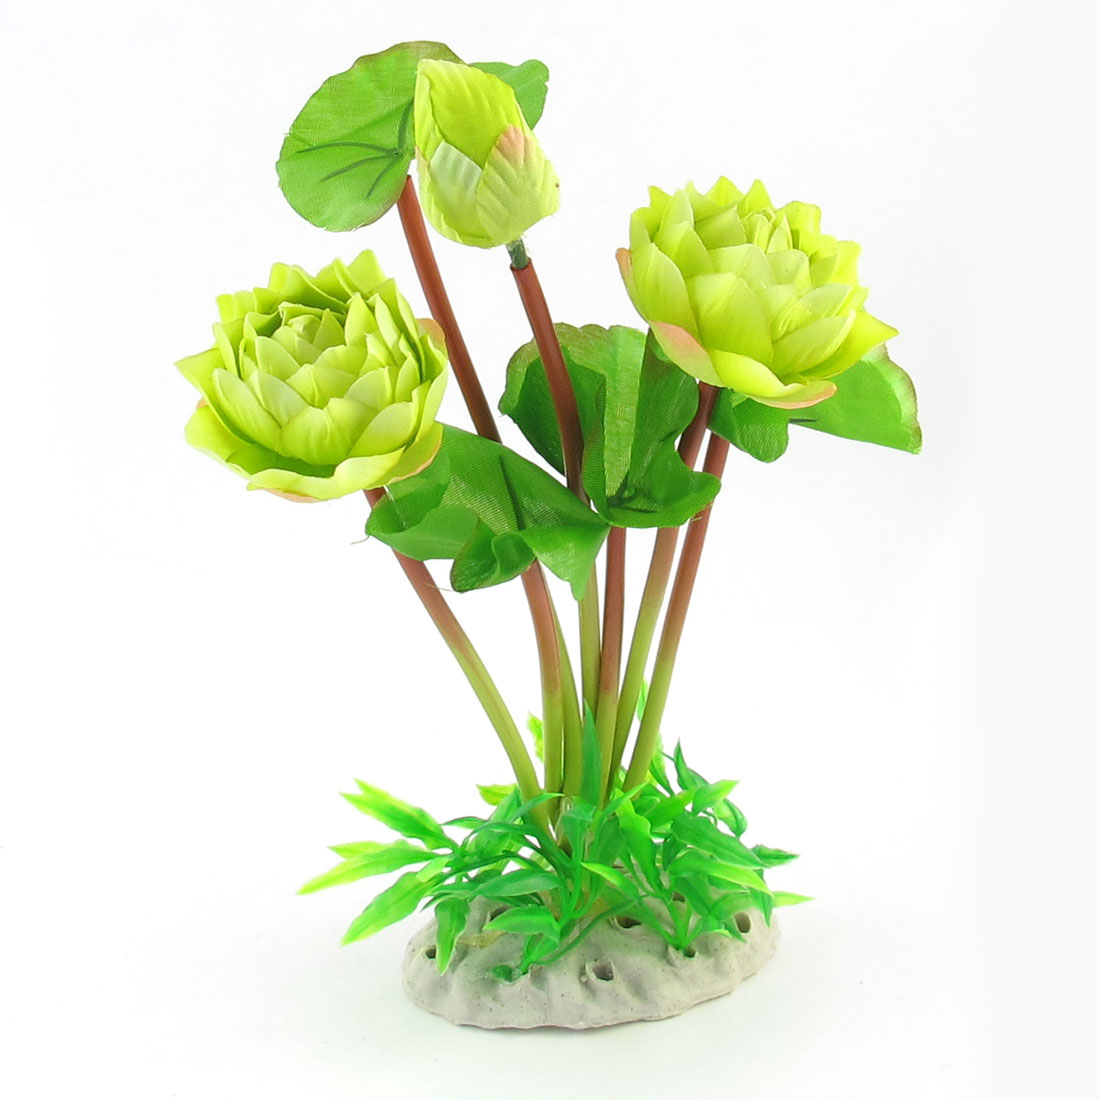 "9.4"" High Yellow Green Simulation Aquarium Underwater Plant Flower Ornament"